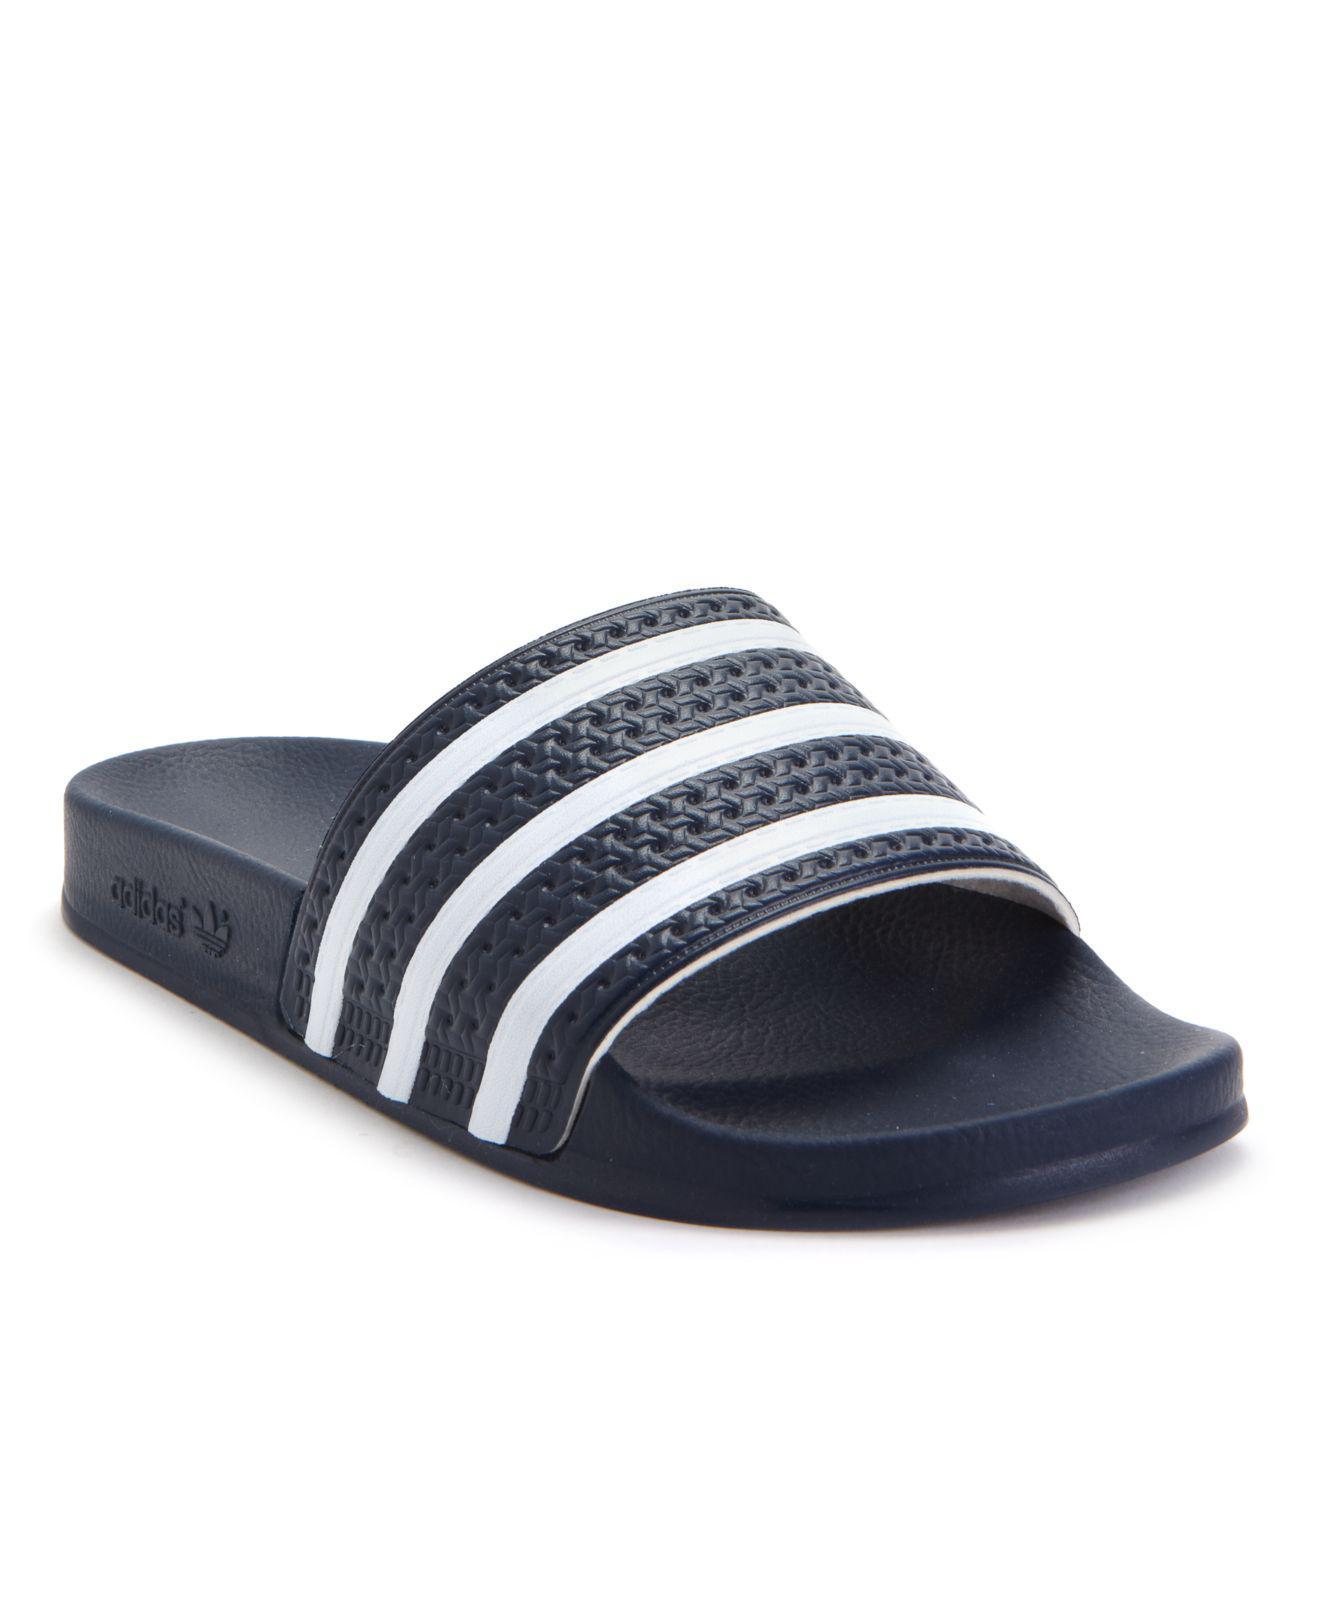 lyst adidas uomini adilette slide sandali dal traguardo in blu